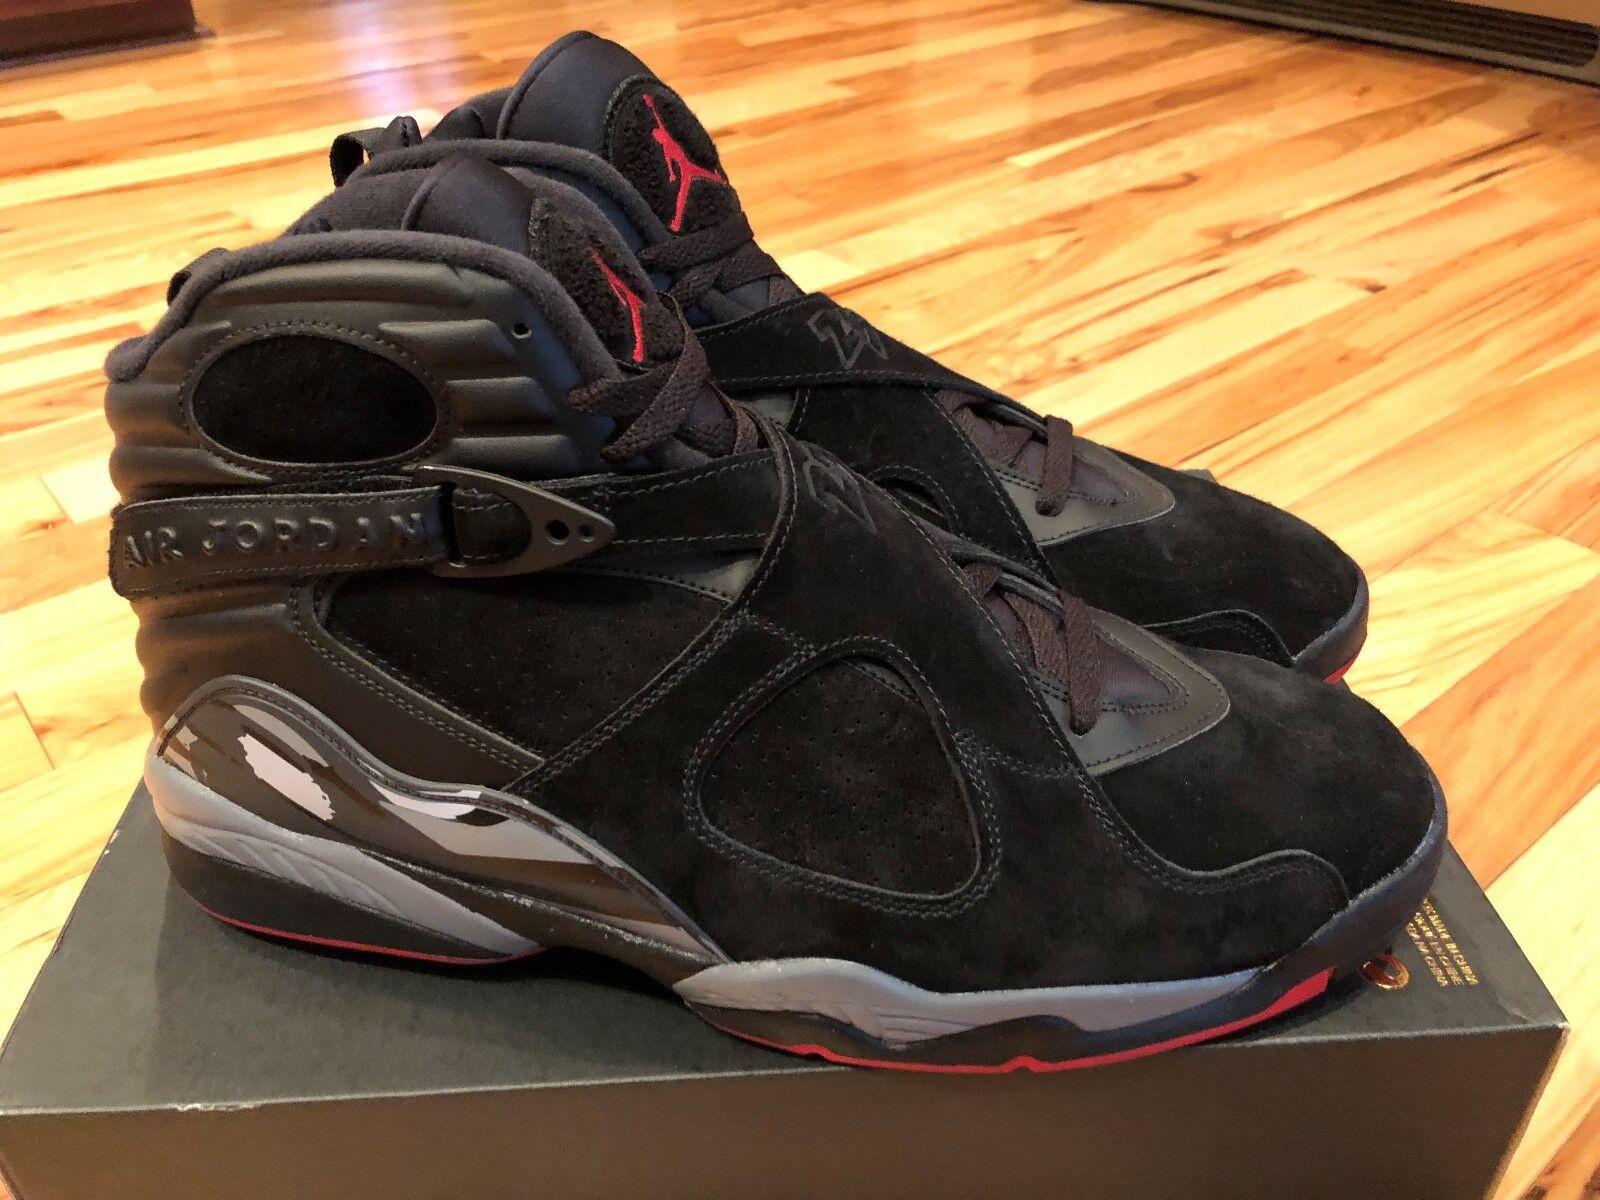 Nike Air Jordan 8 Retro Black Gym Red Wolf Grey 305381-022 Men's Size 15